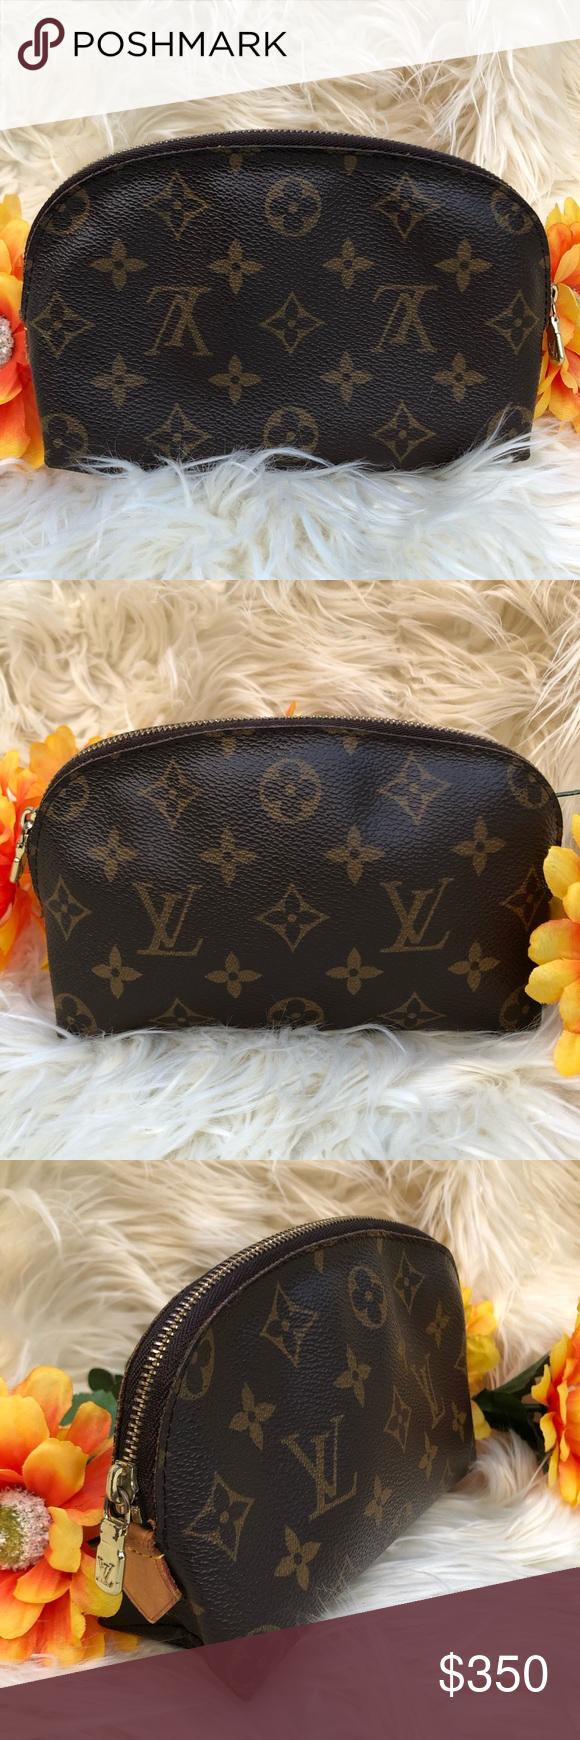 💜 Louis Vuitton Monogram Cosmetic Pouch ECU Adorable LV cosmetic pouch in excellent condition   Mono...